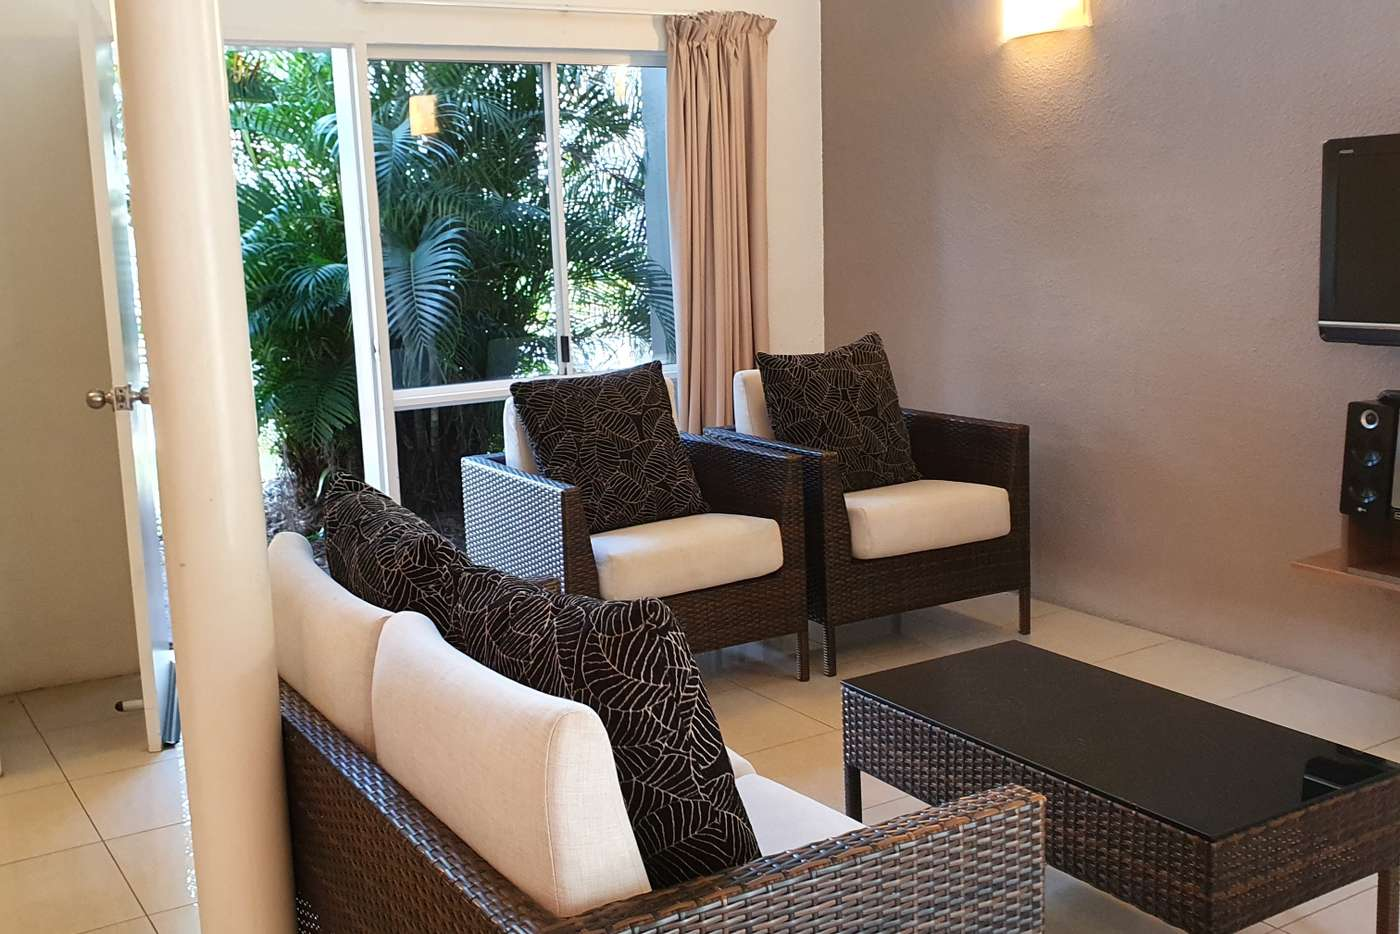 Main view of Homely apartment listing, Villa 17 Reef Resort 121 Port Douglas Rd, Port Douglas QLD 4877